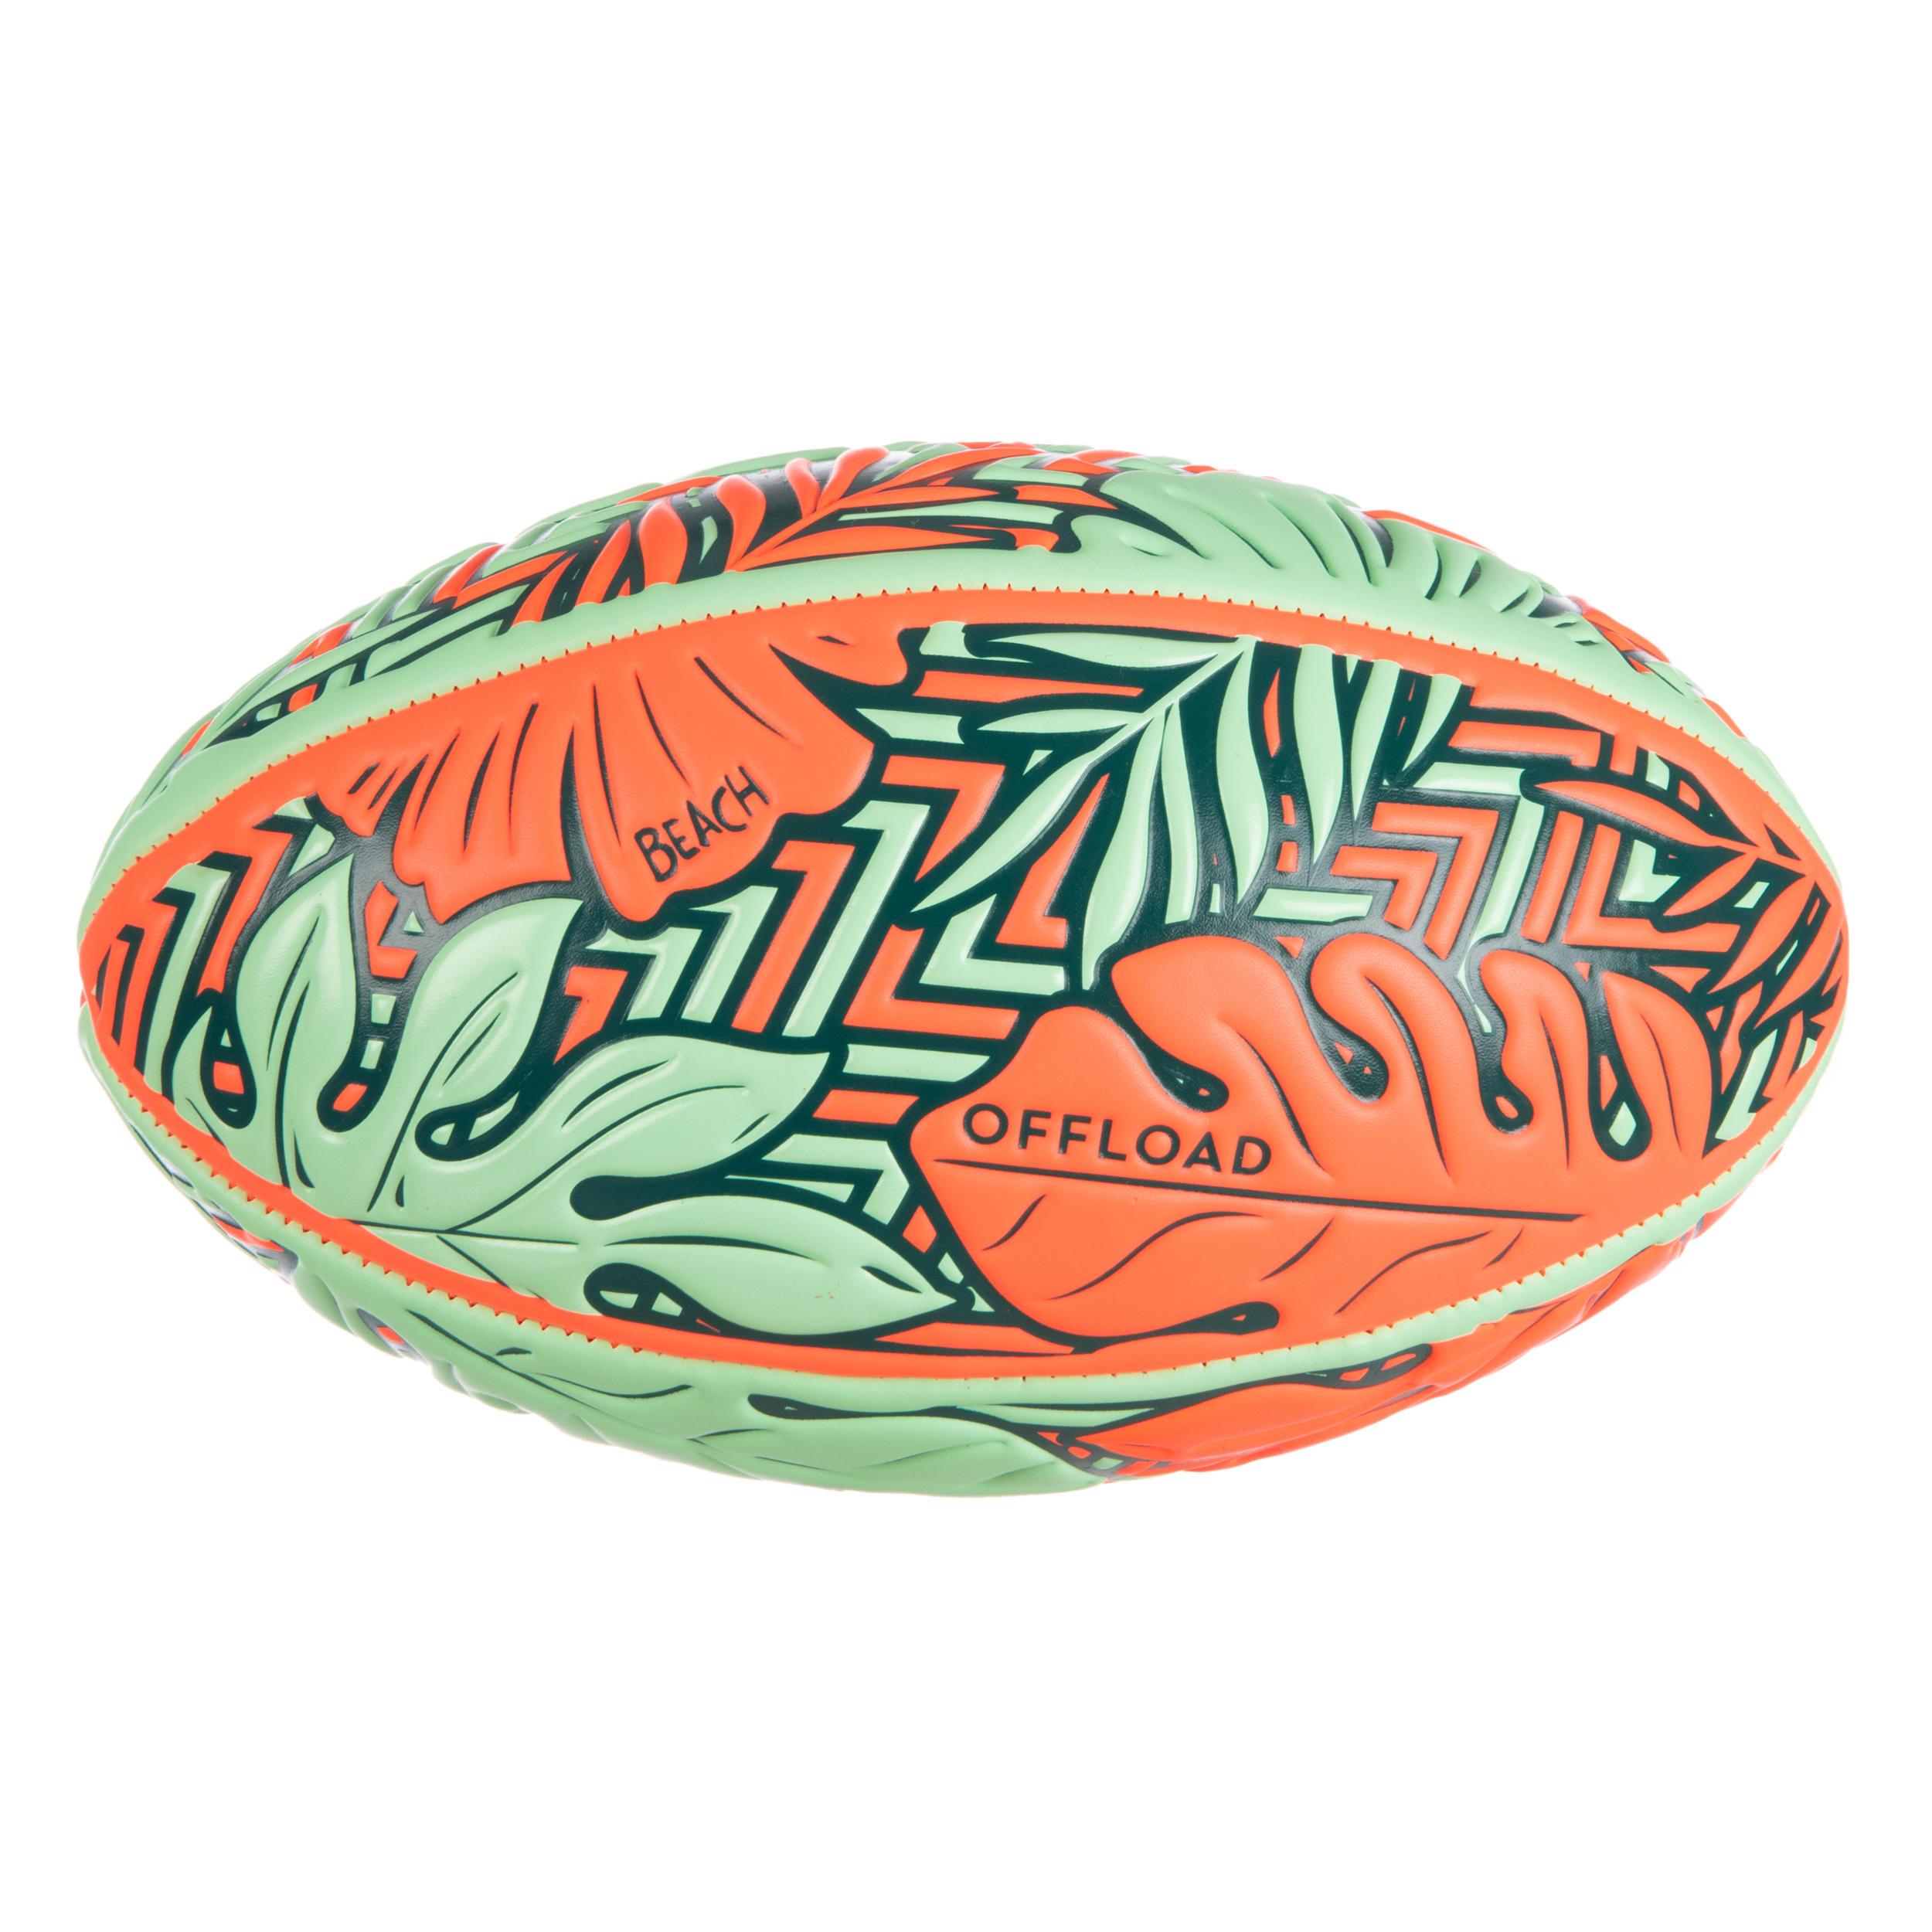 Minge Mid Rugby R100